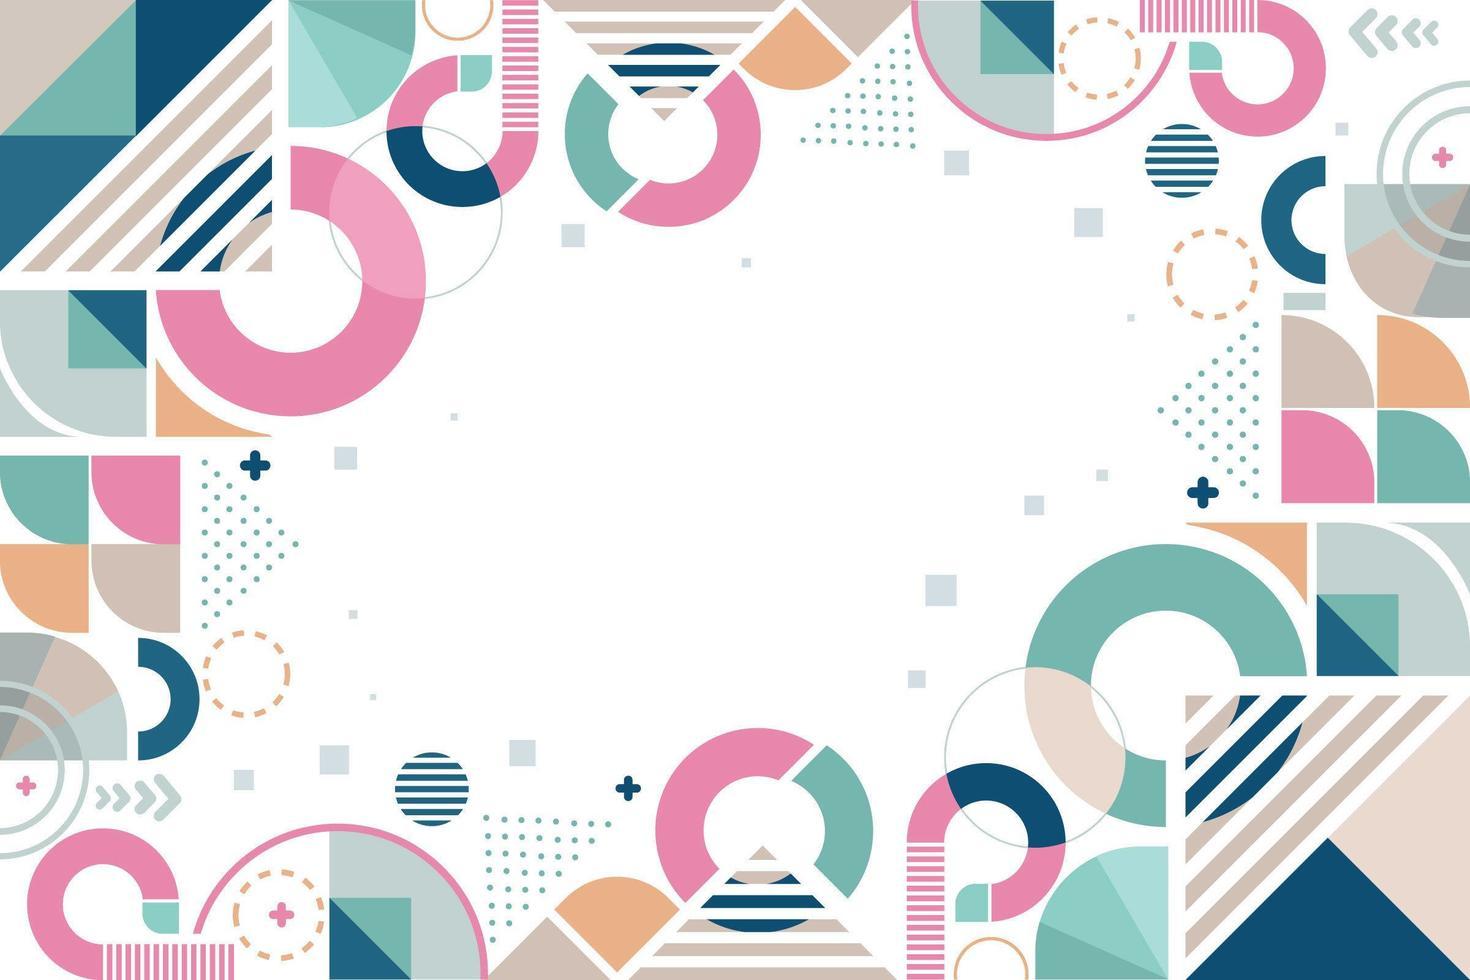 geometrisk design med pastellfärger vektor